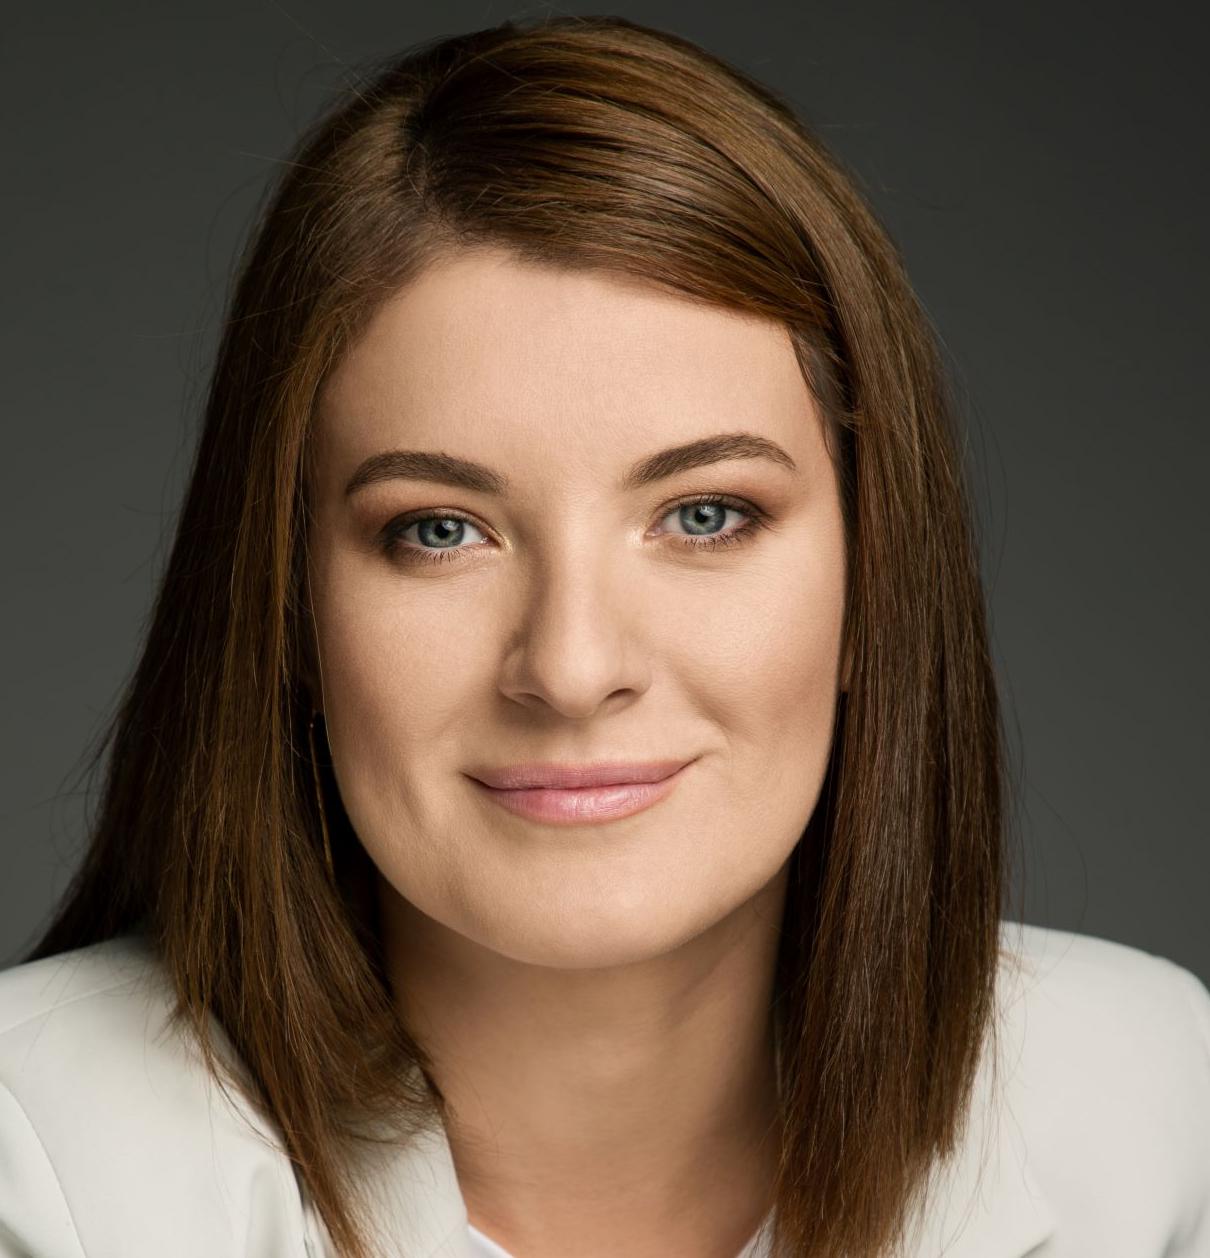 Alina Munteanu